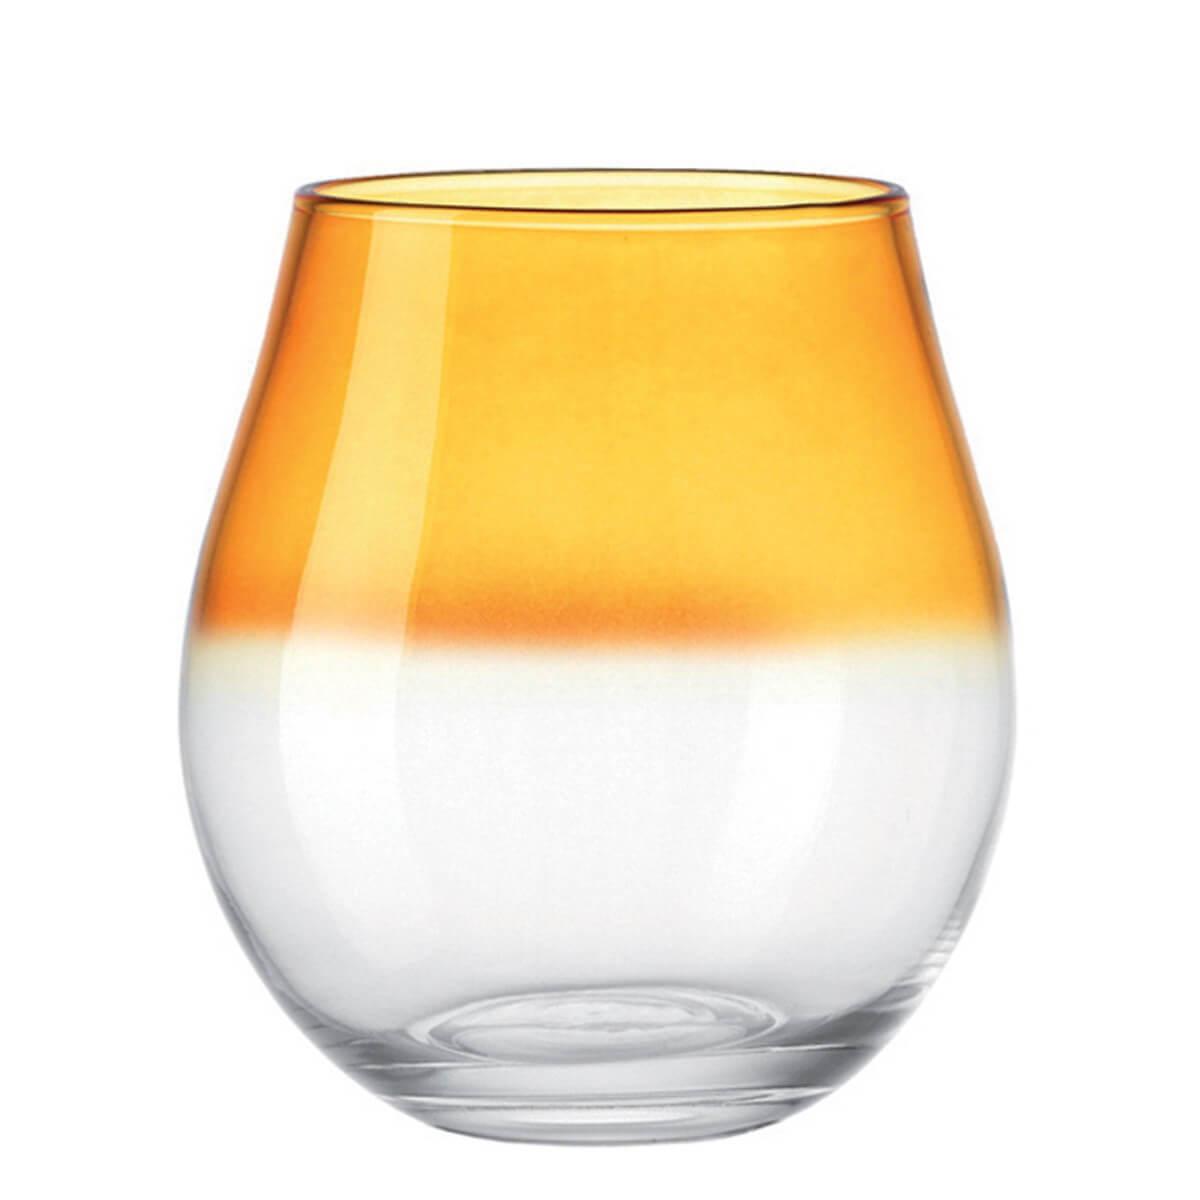 Leonardo Windlicht Orange / Klar